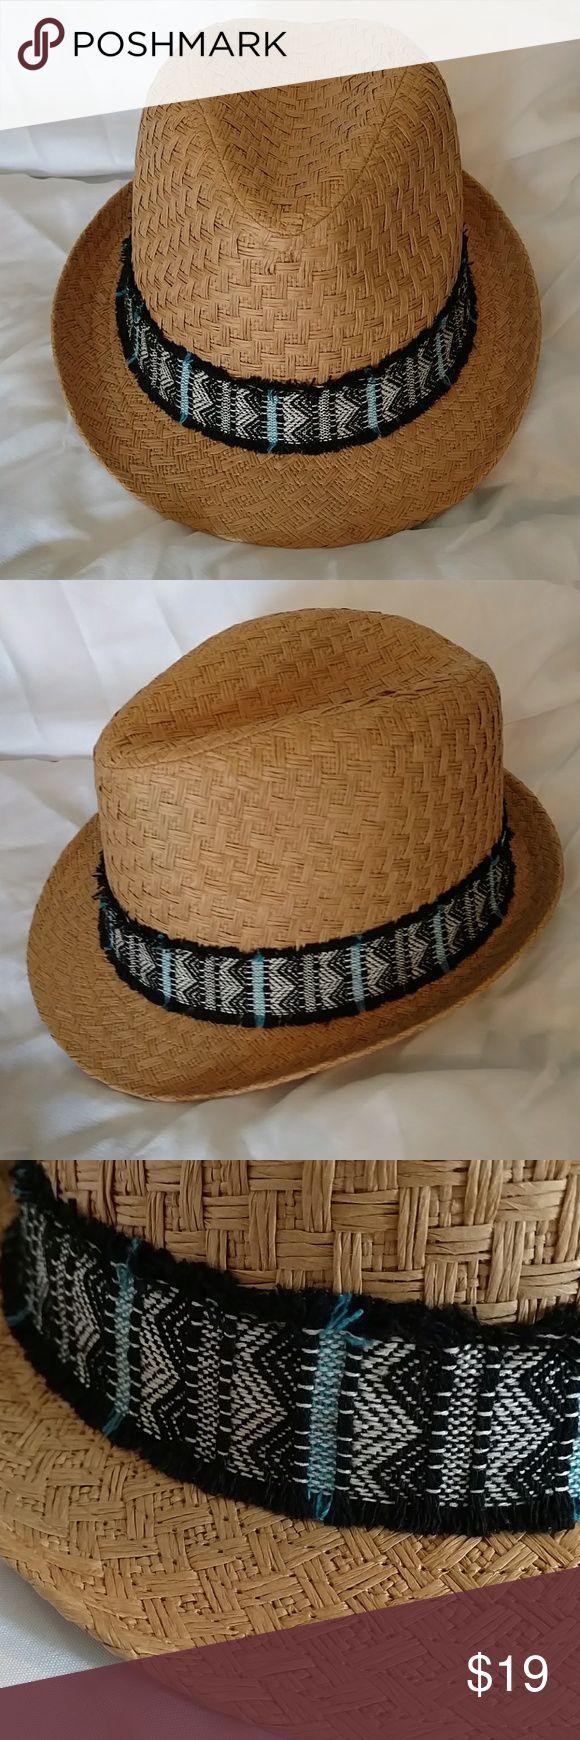 Boho Aztec Band Straw Fedora NWOT BOHO Aztec Print Wide Band Straw Fedora. Dark Natural Woven Straw. NWOT! ONE SIZE Accessories Hats